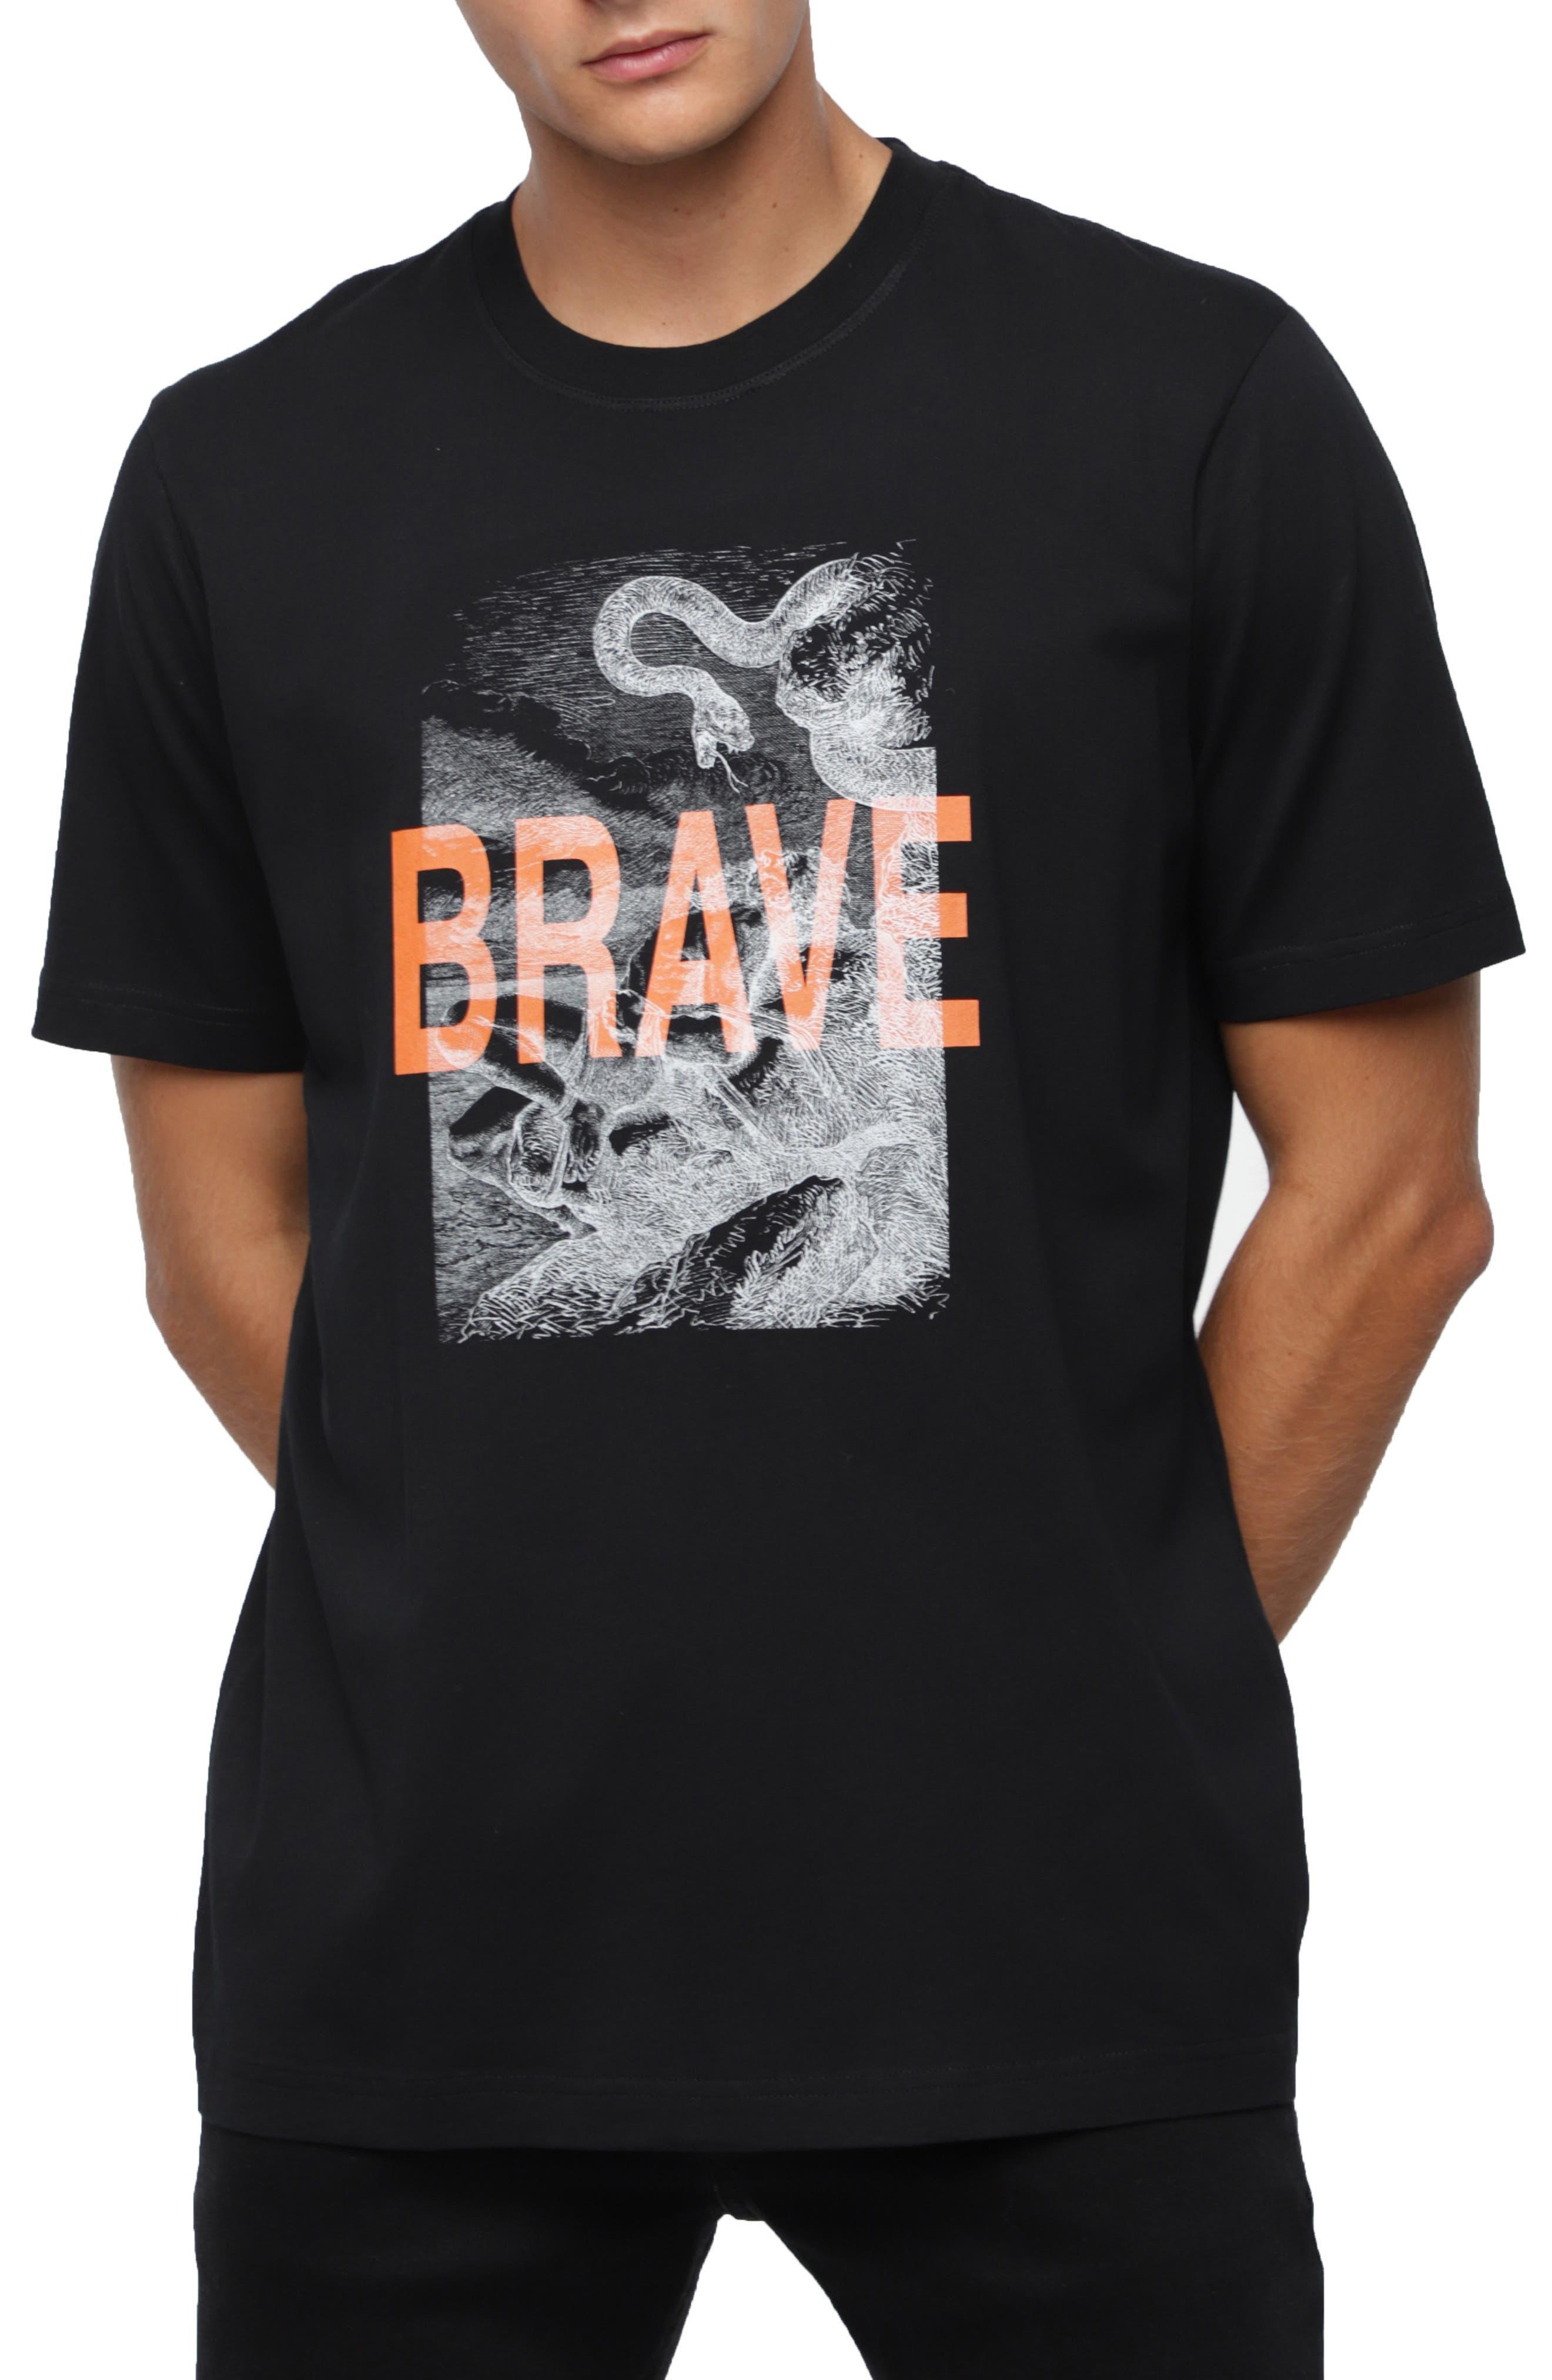 T-JUST-XZ Short Sleeve T-shirt,                             Main thumbnail 1, color,                             BLACK